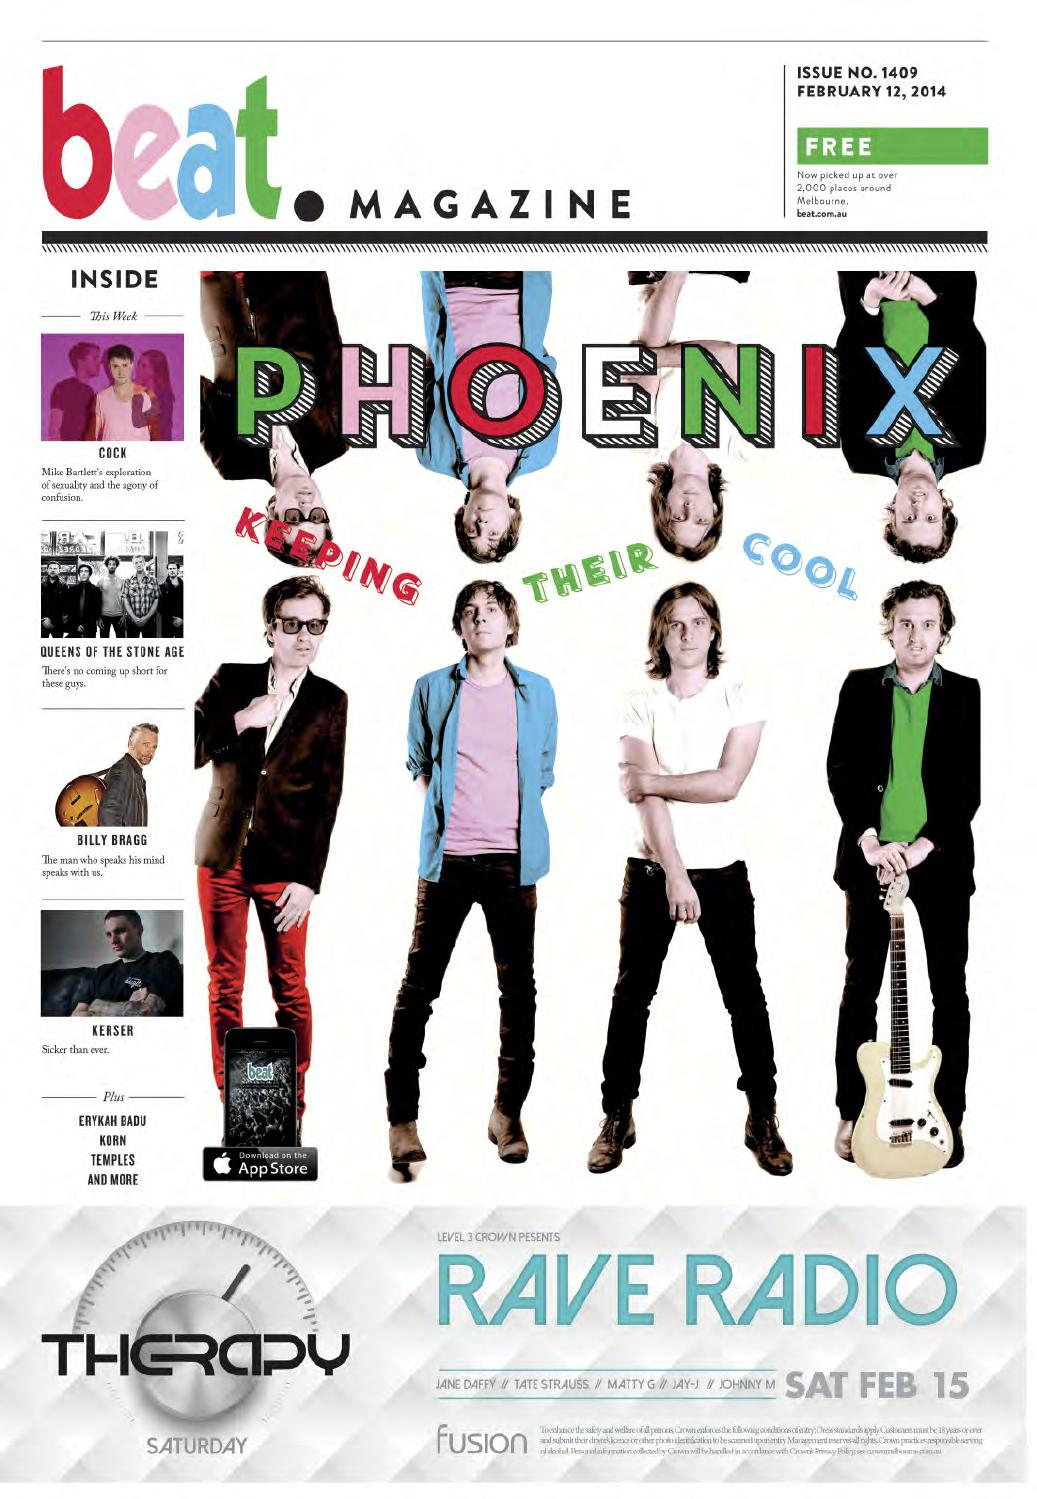 0edc71459873b Beat Magazine #1409 by Furst Media - issuu